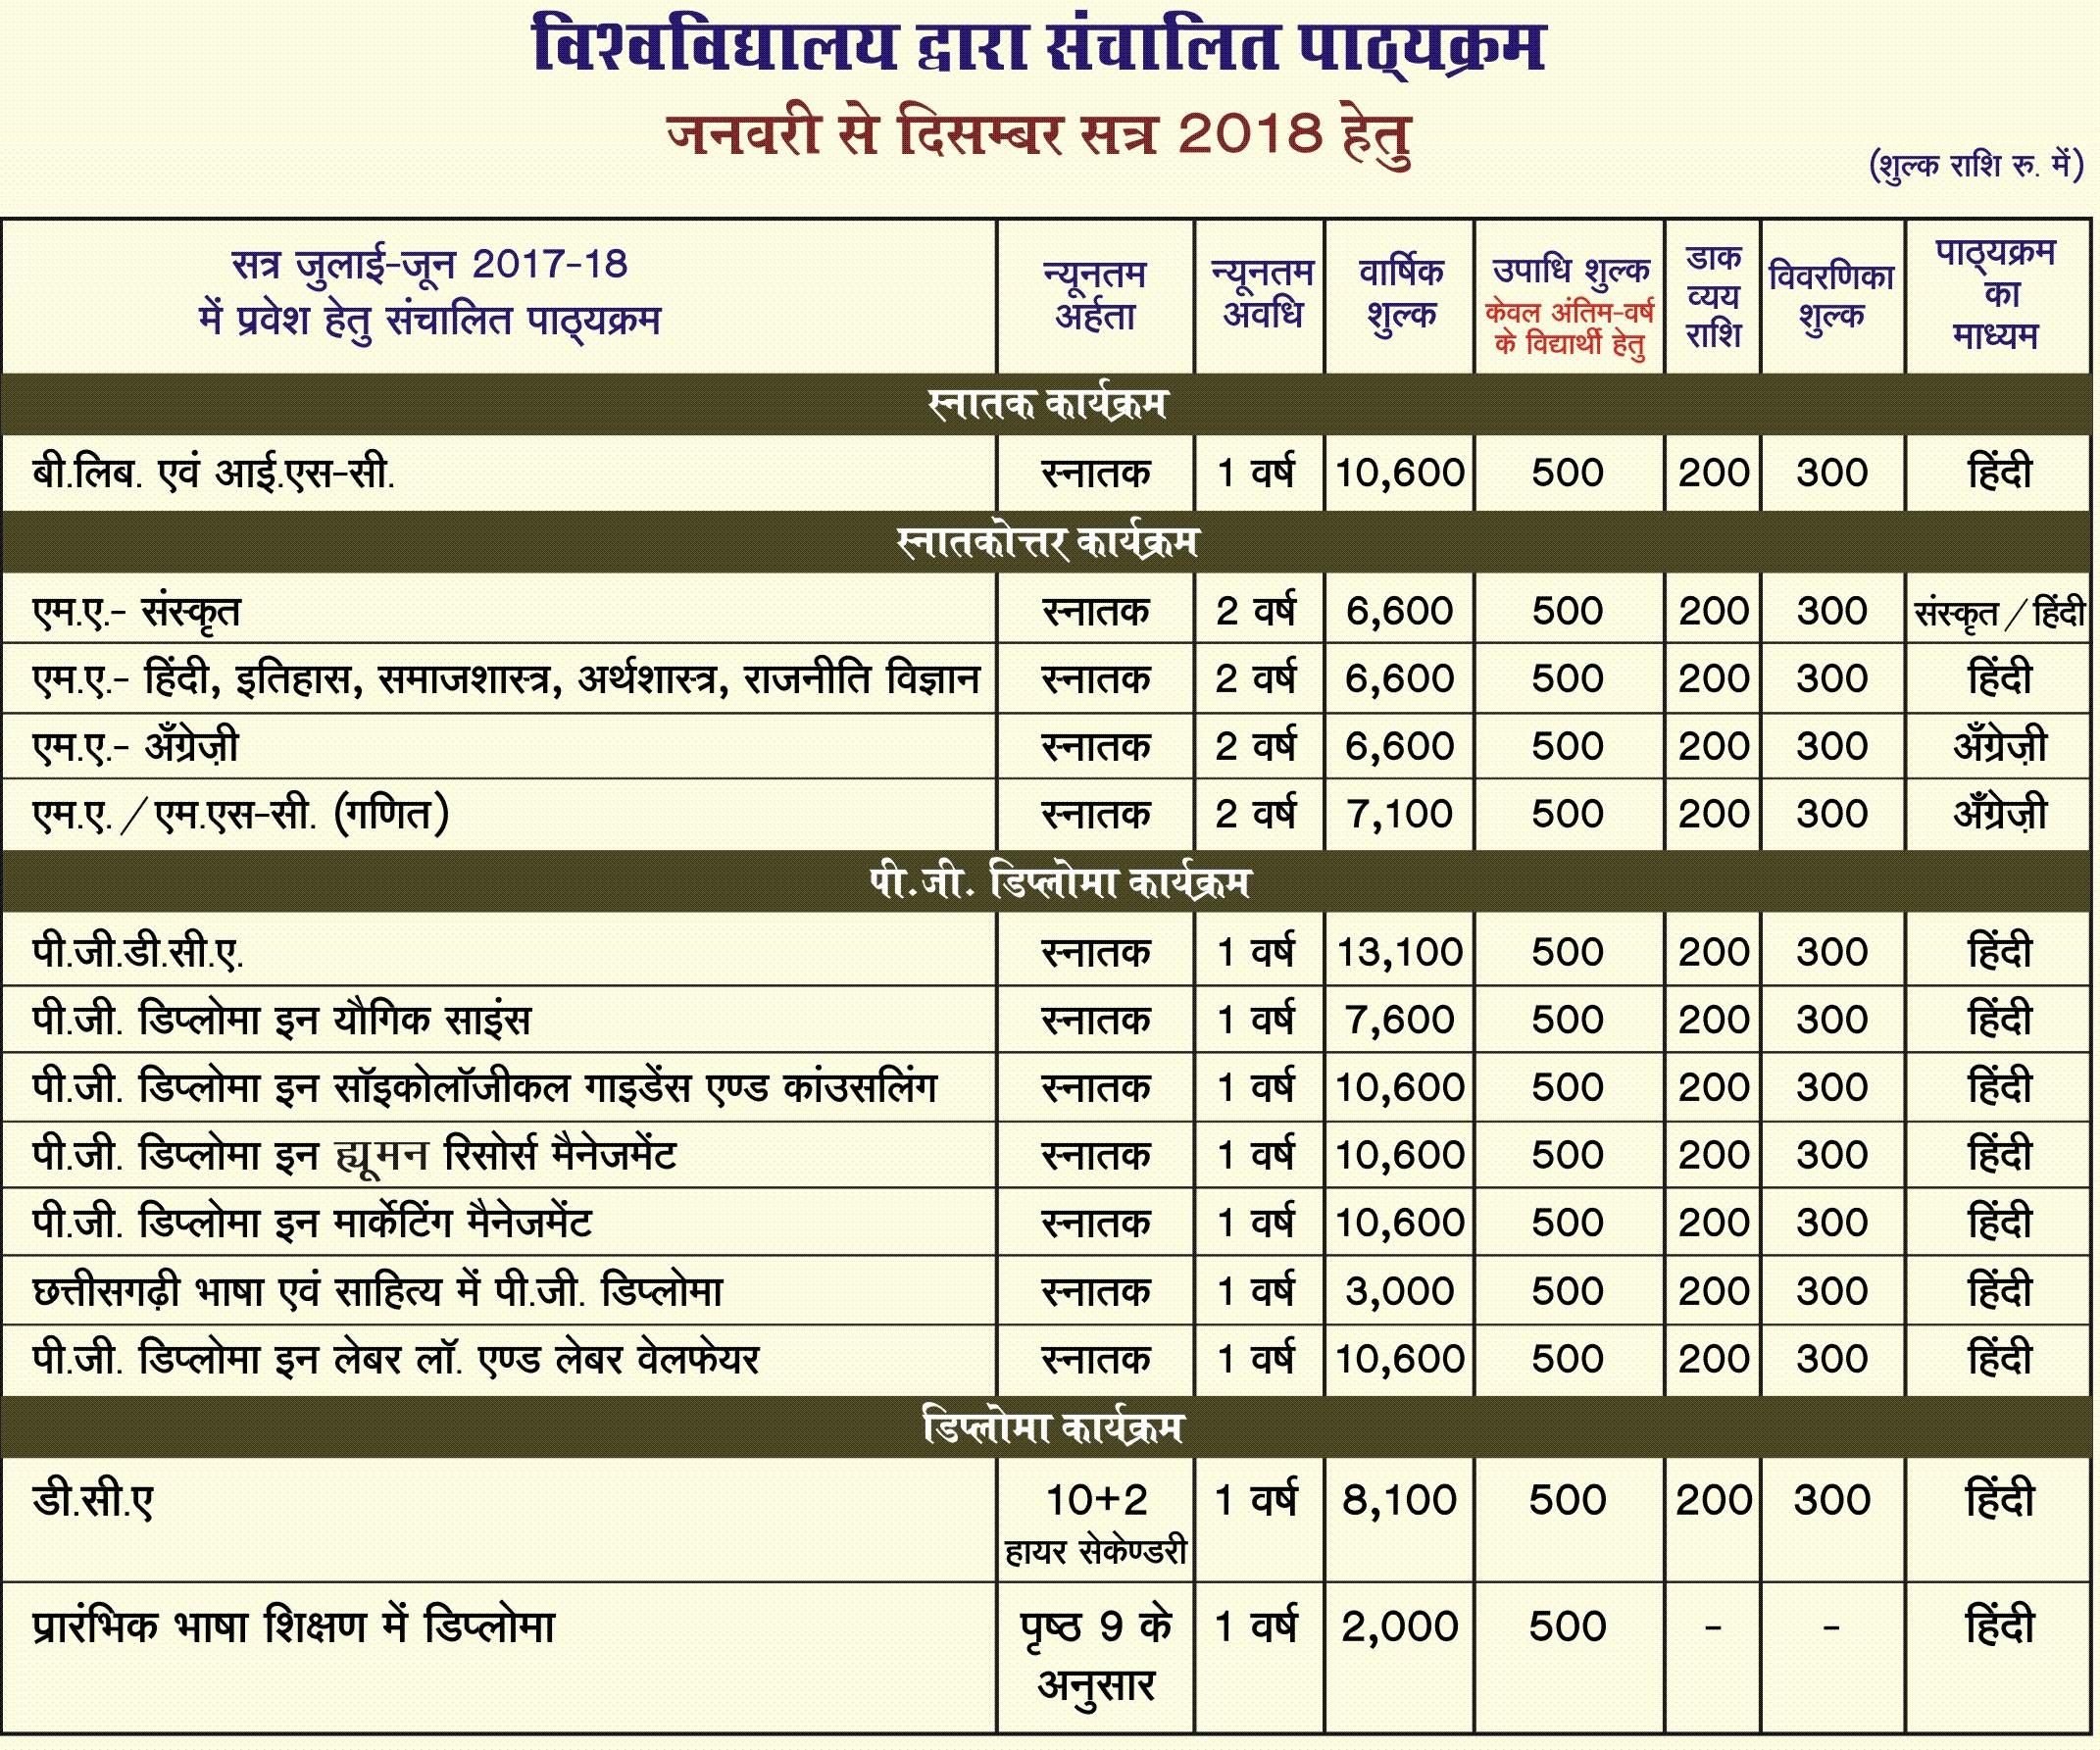 Pt. Sundarlal Sharma (Open) University Fee Structure